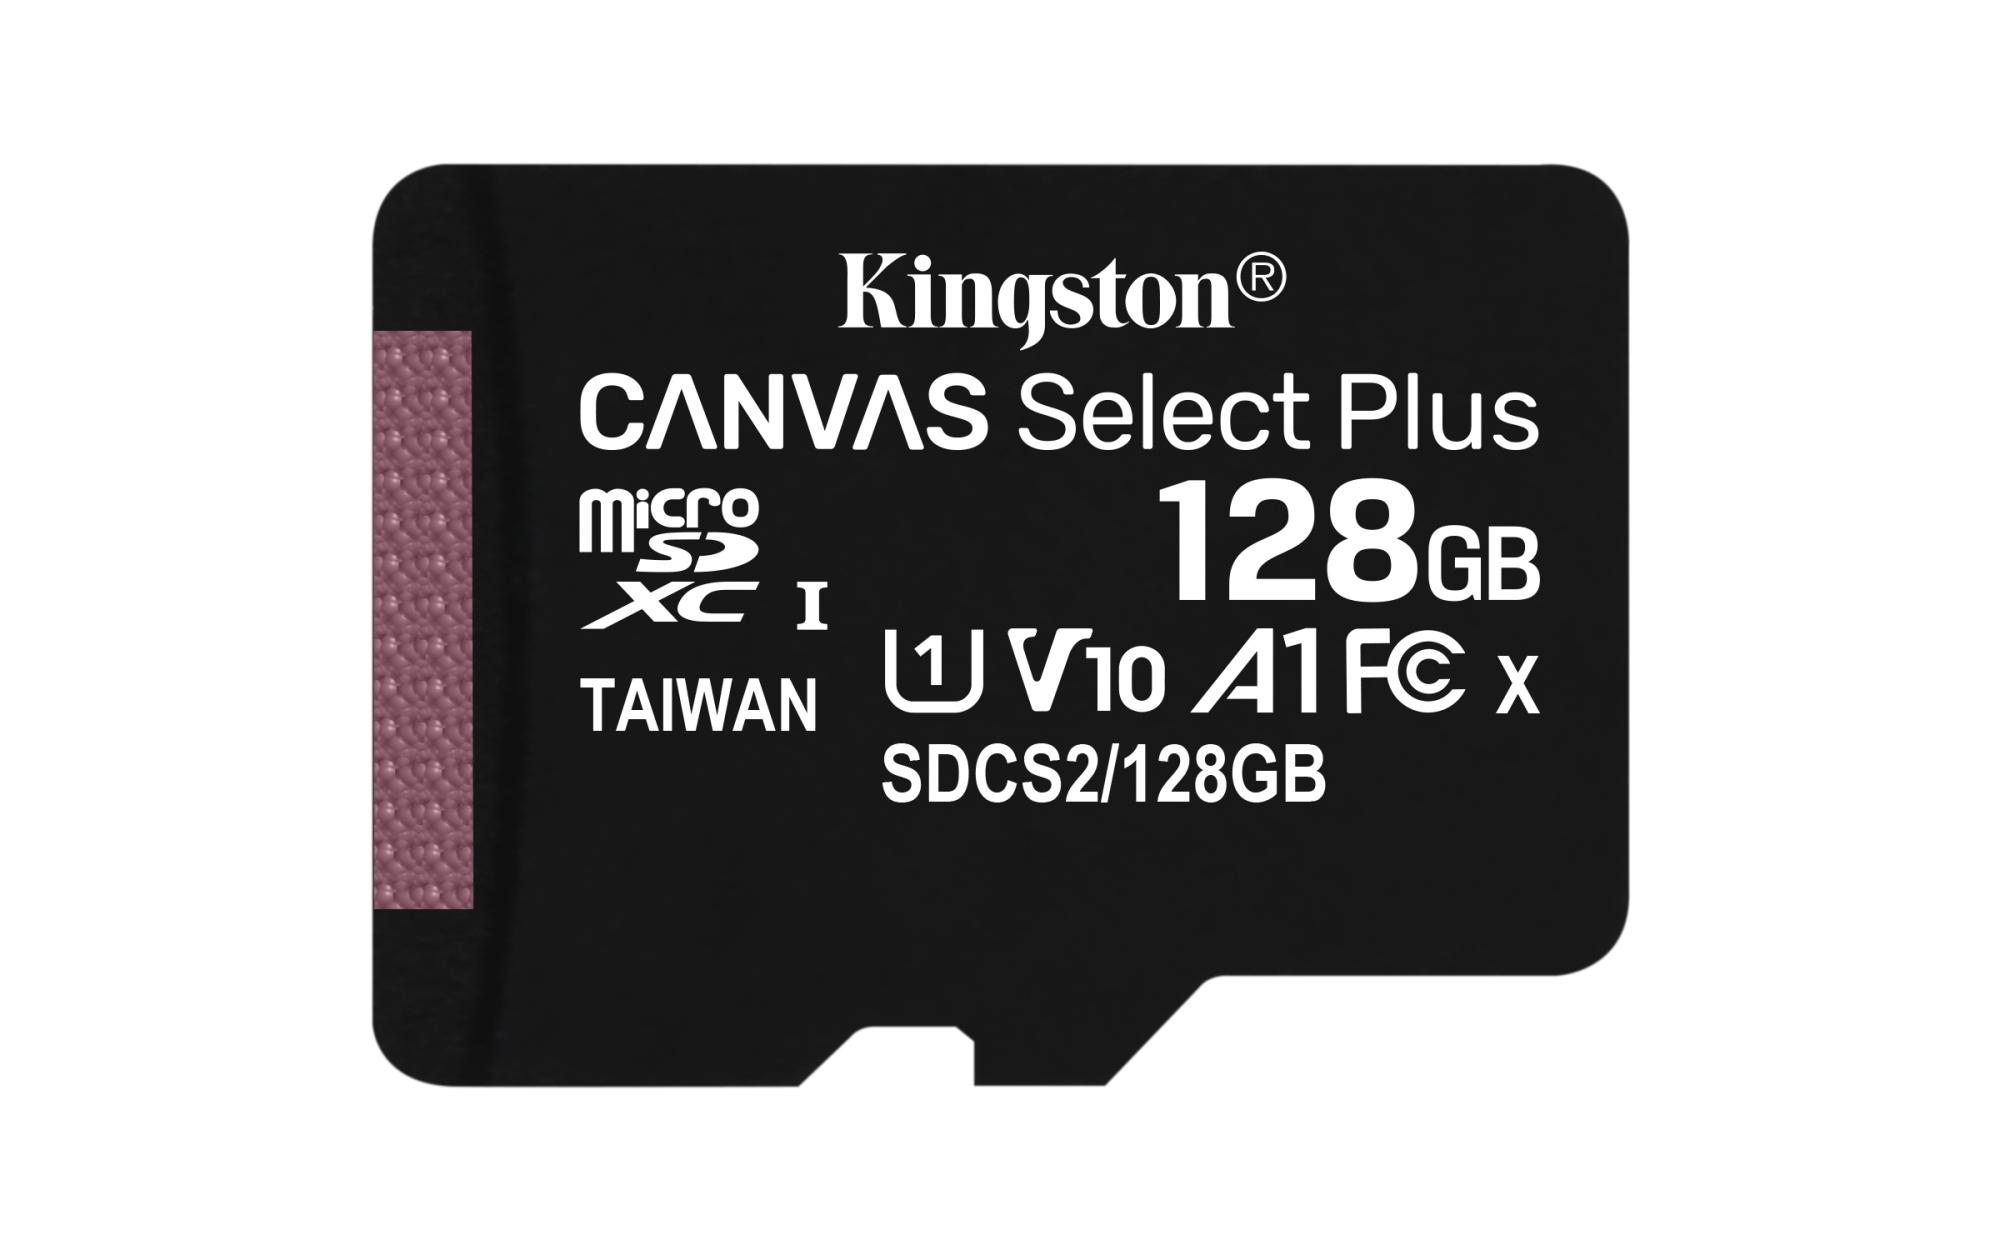 CANVAS SELECT PLUS MEMORIA FLASH 128 GB MICROSDXC CLASE 10 UHS-I